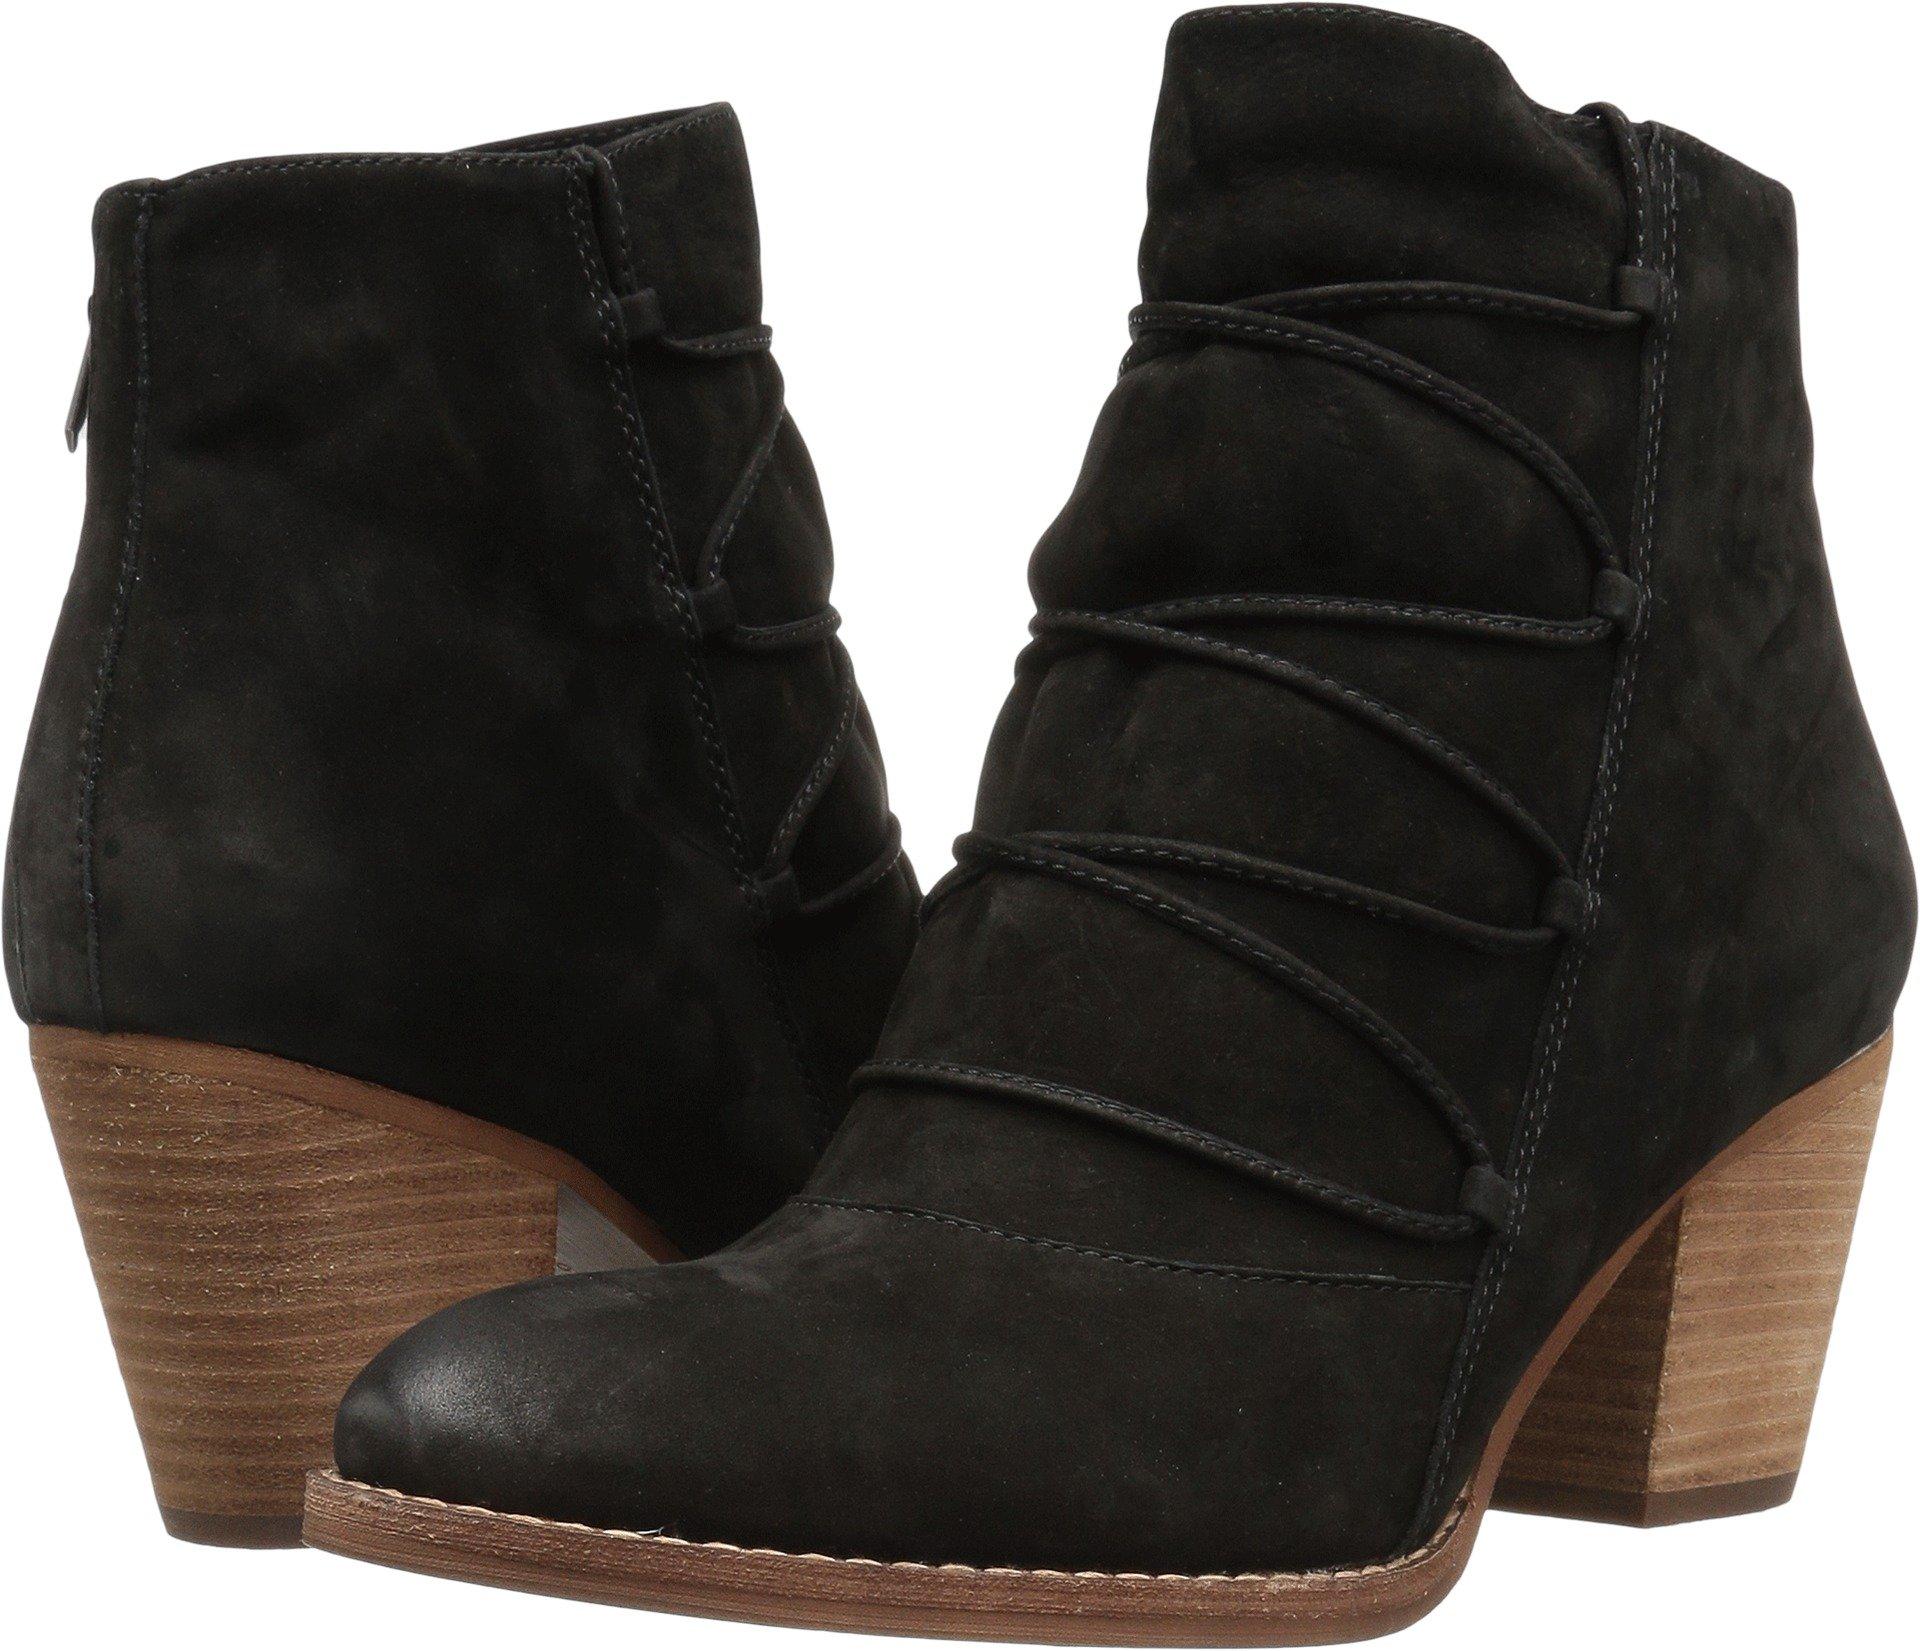 Sam Edelman Women's Millard Ankle Boot, Black Leather, 8 Medium US